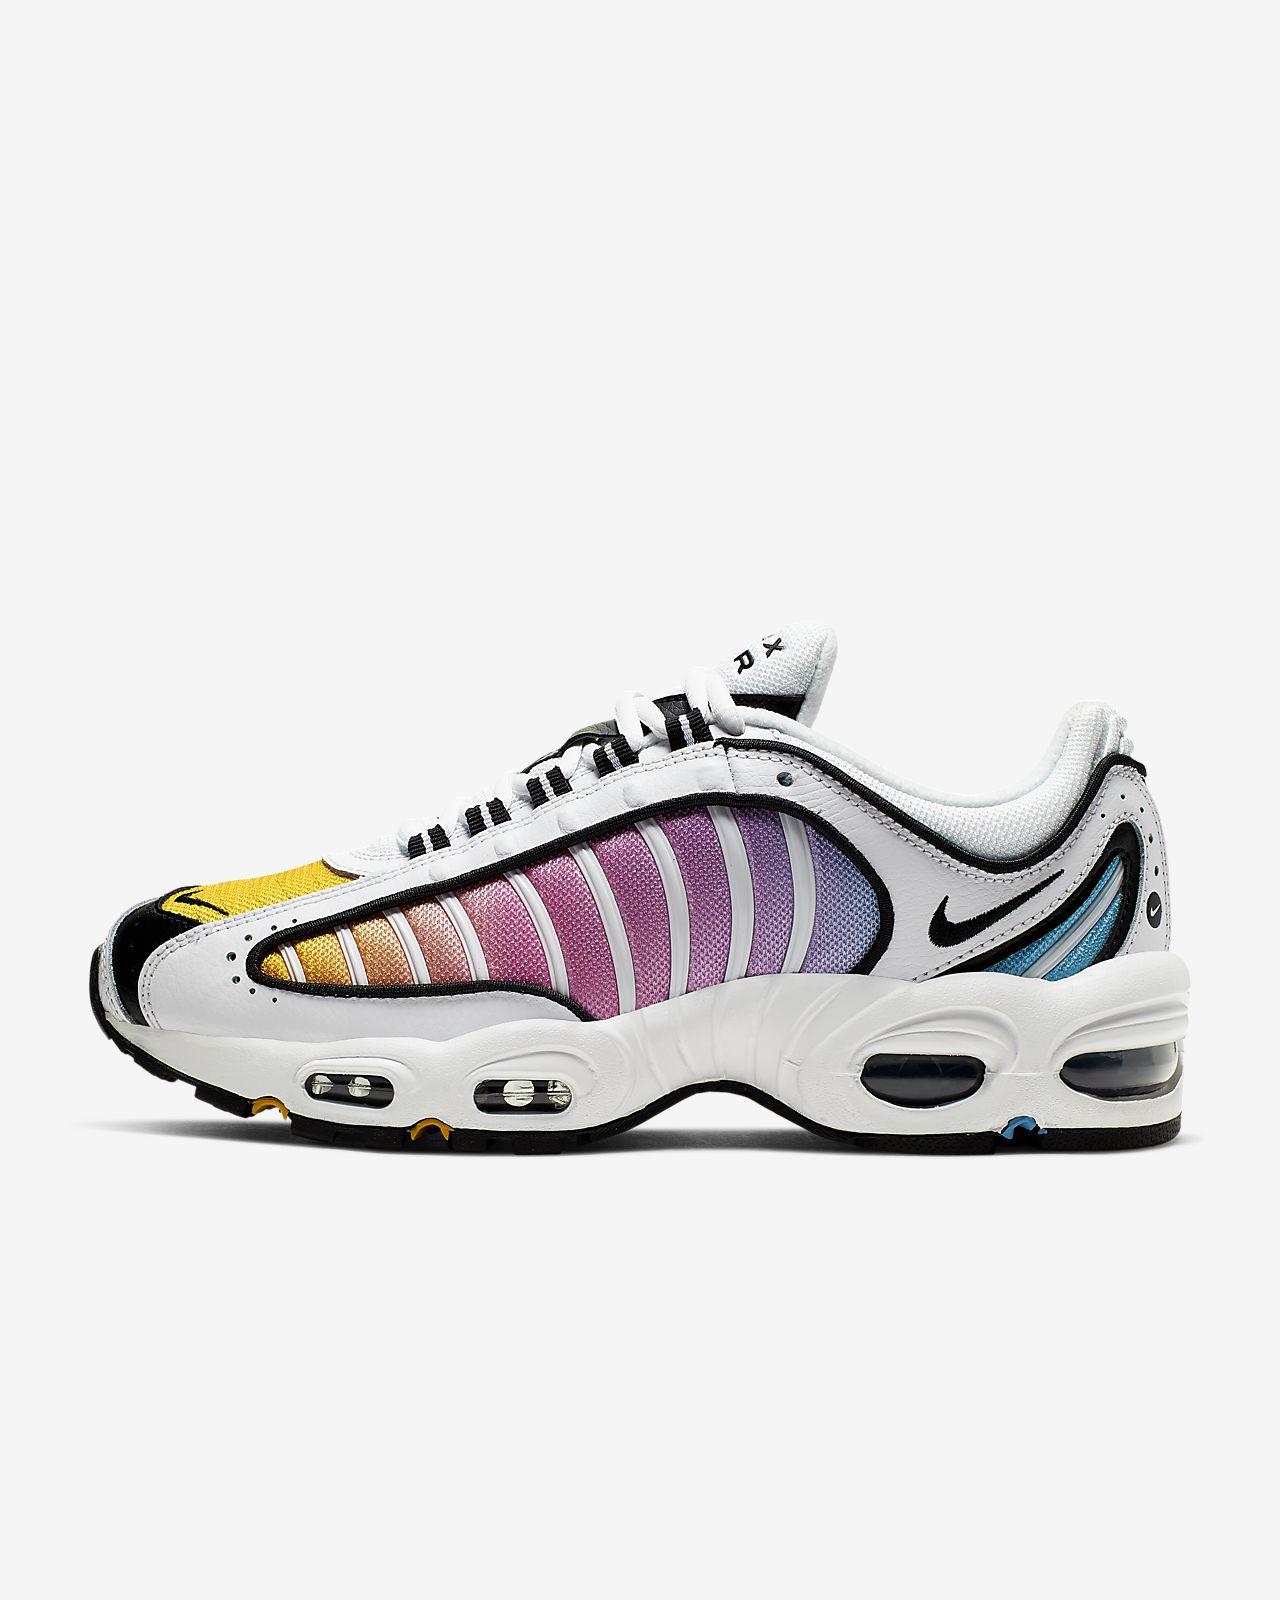 Buty damskie Nike Air Max Tailwind IV